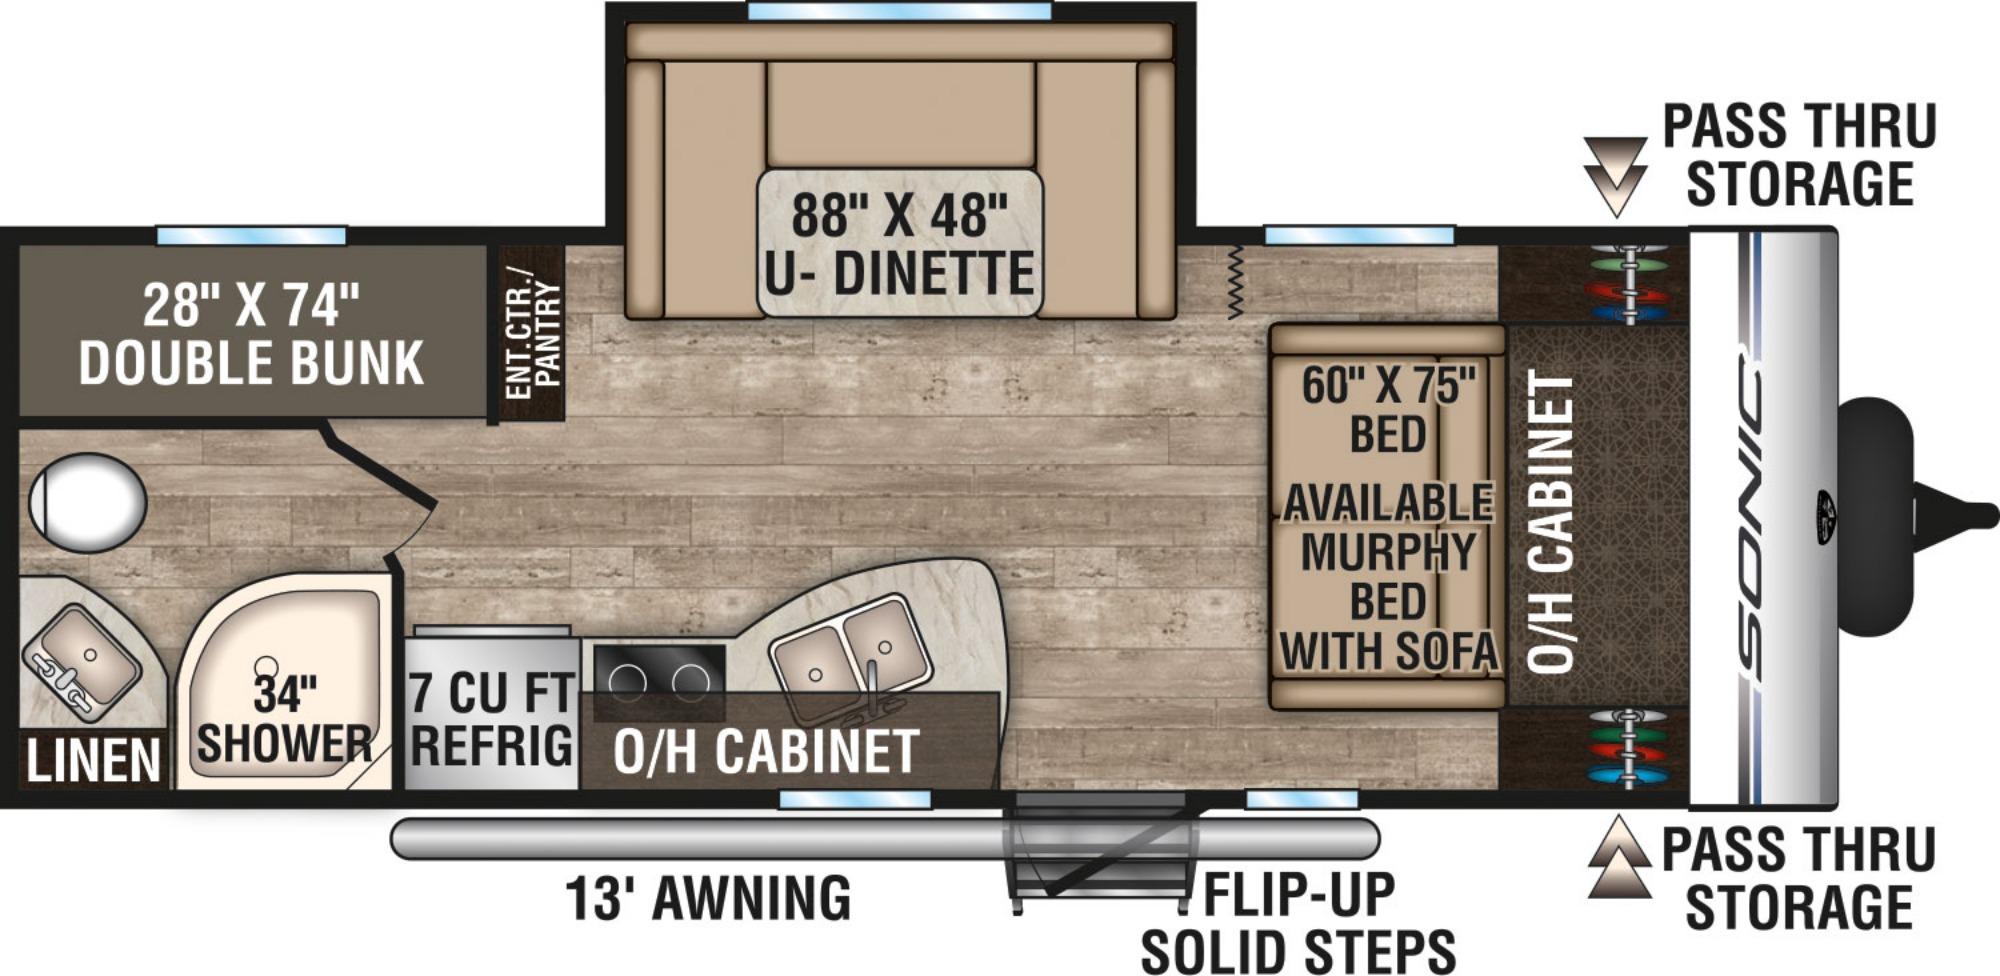 View Floor Plan for 2019 VENTURE RV SONIC 220VBH